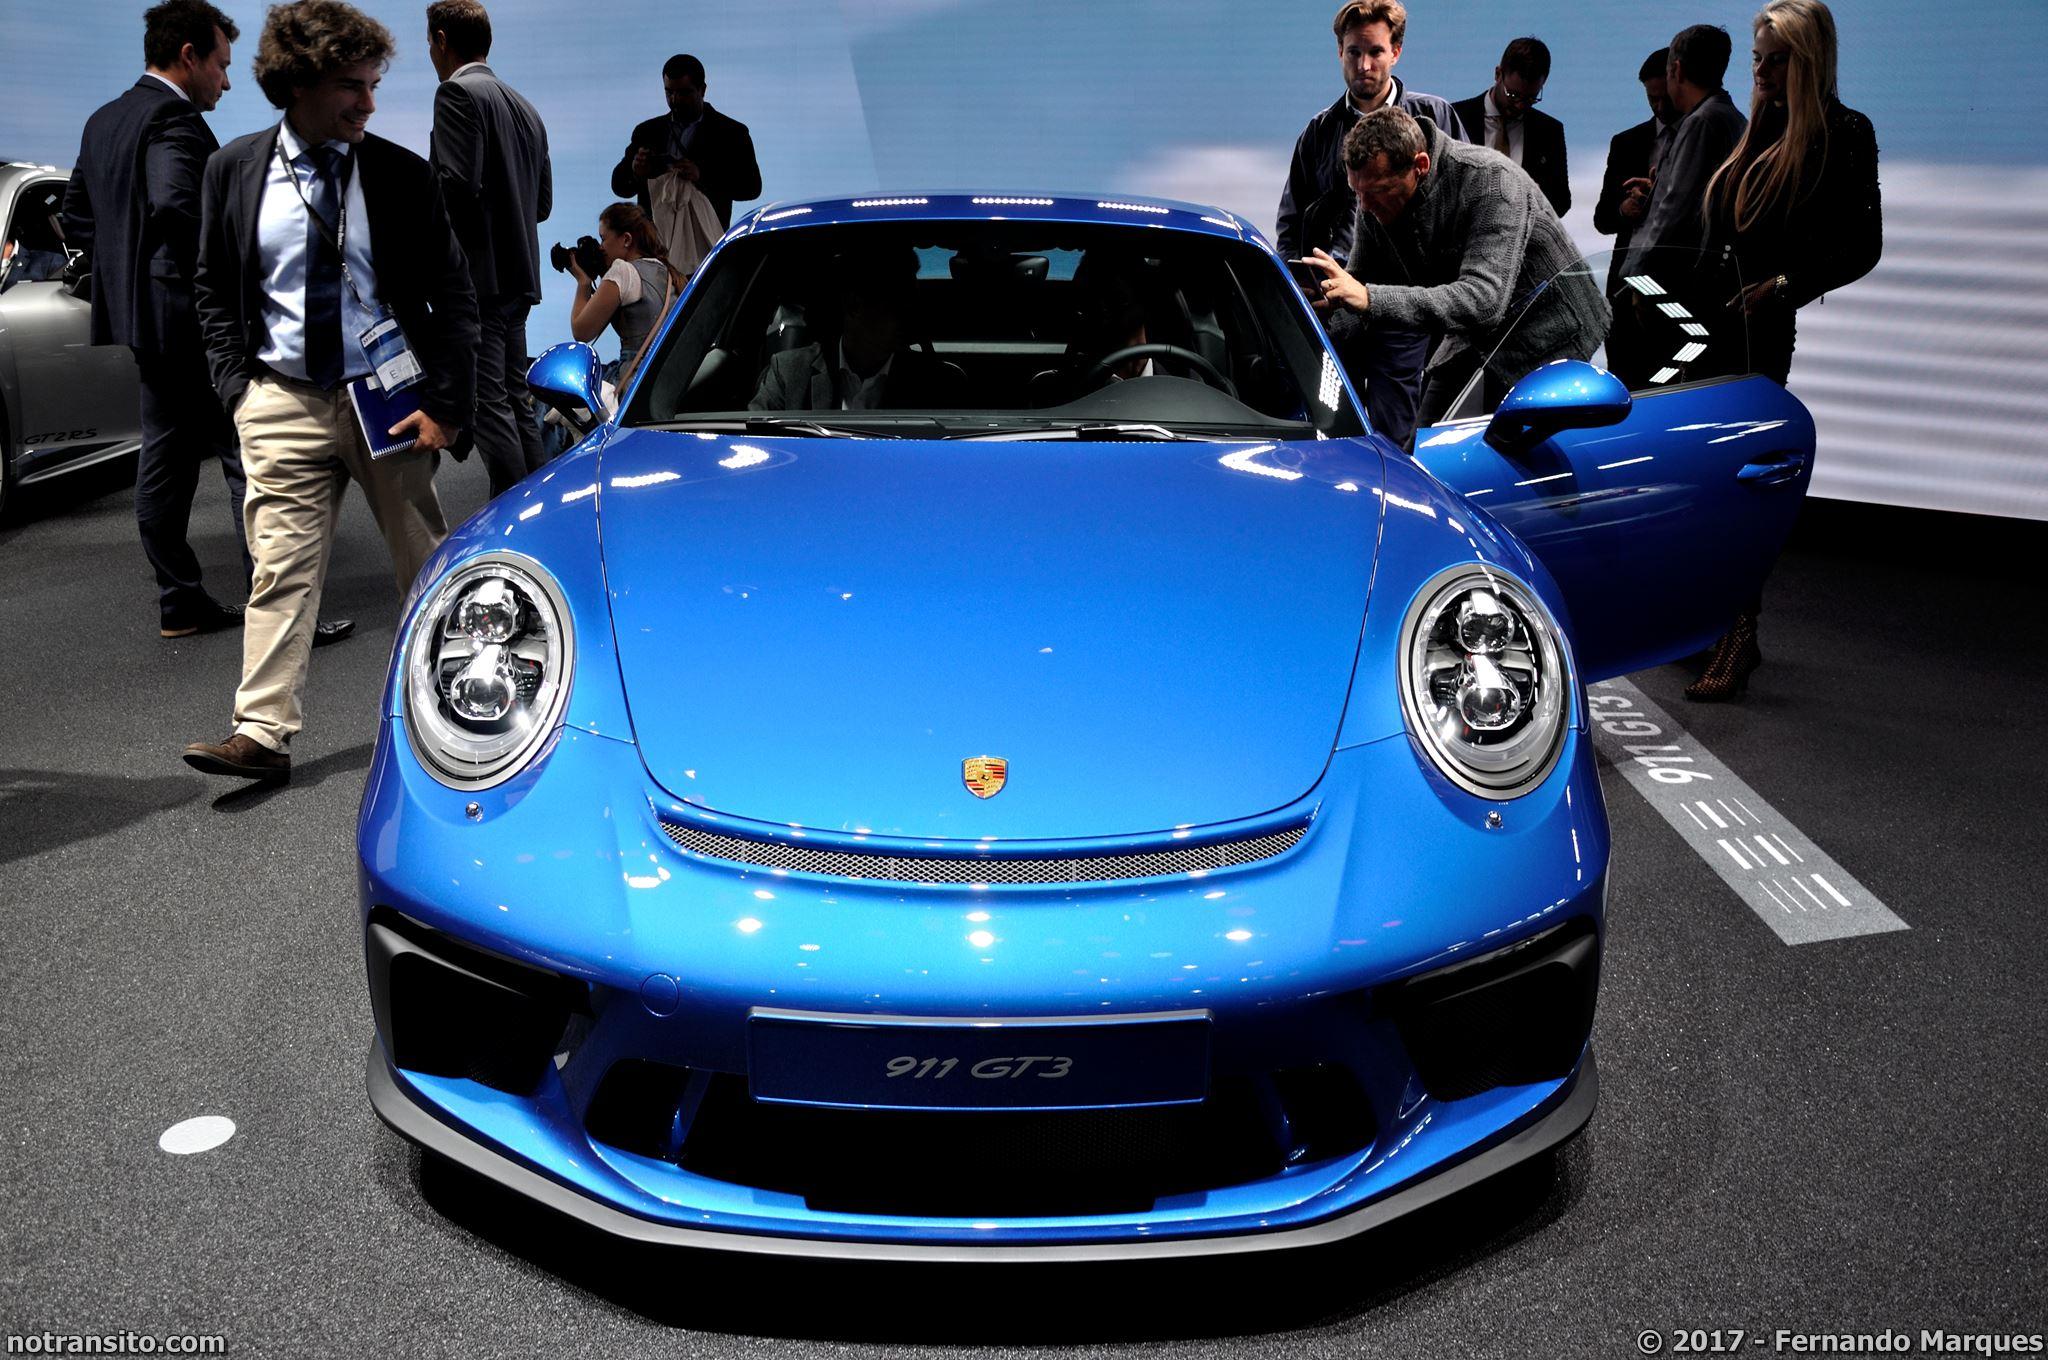 Porsche-911-GT3-Touring-Package-Frankfurt-2017-009